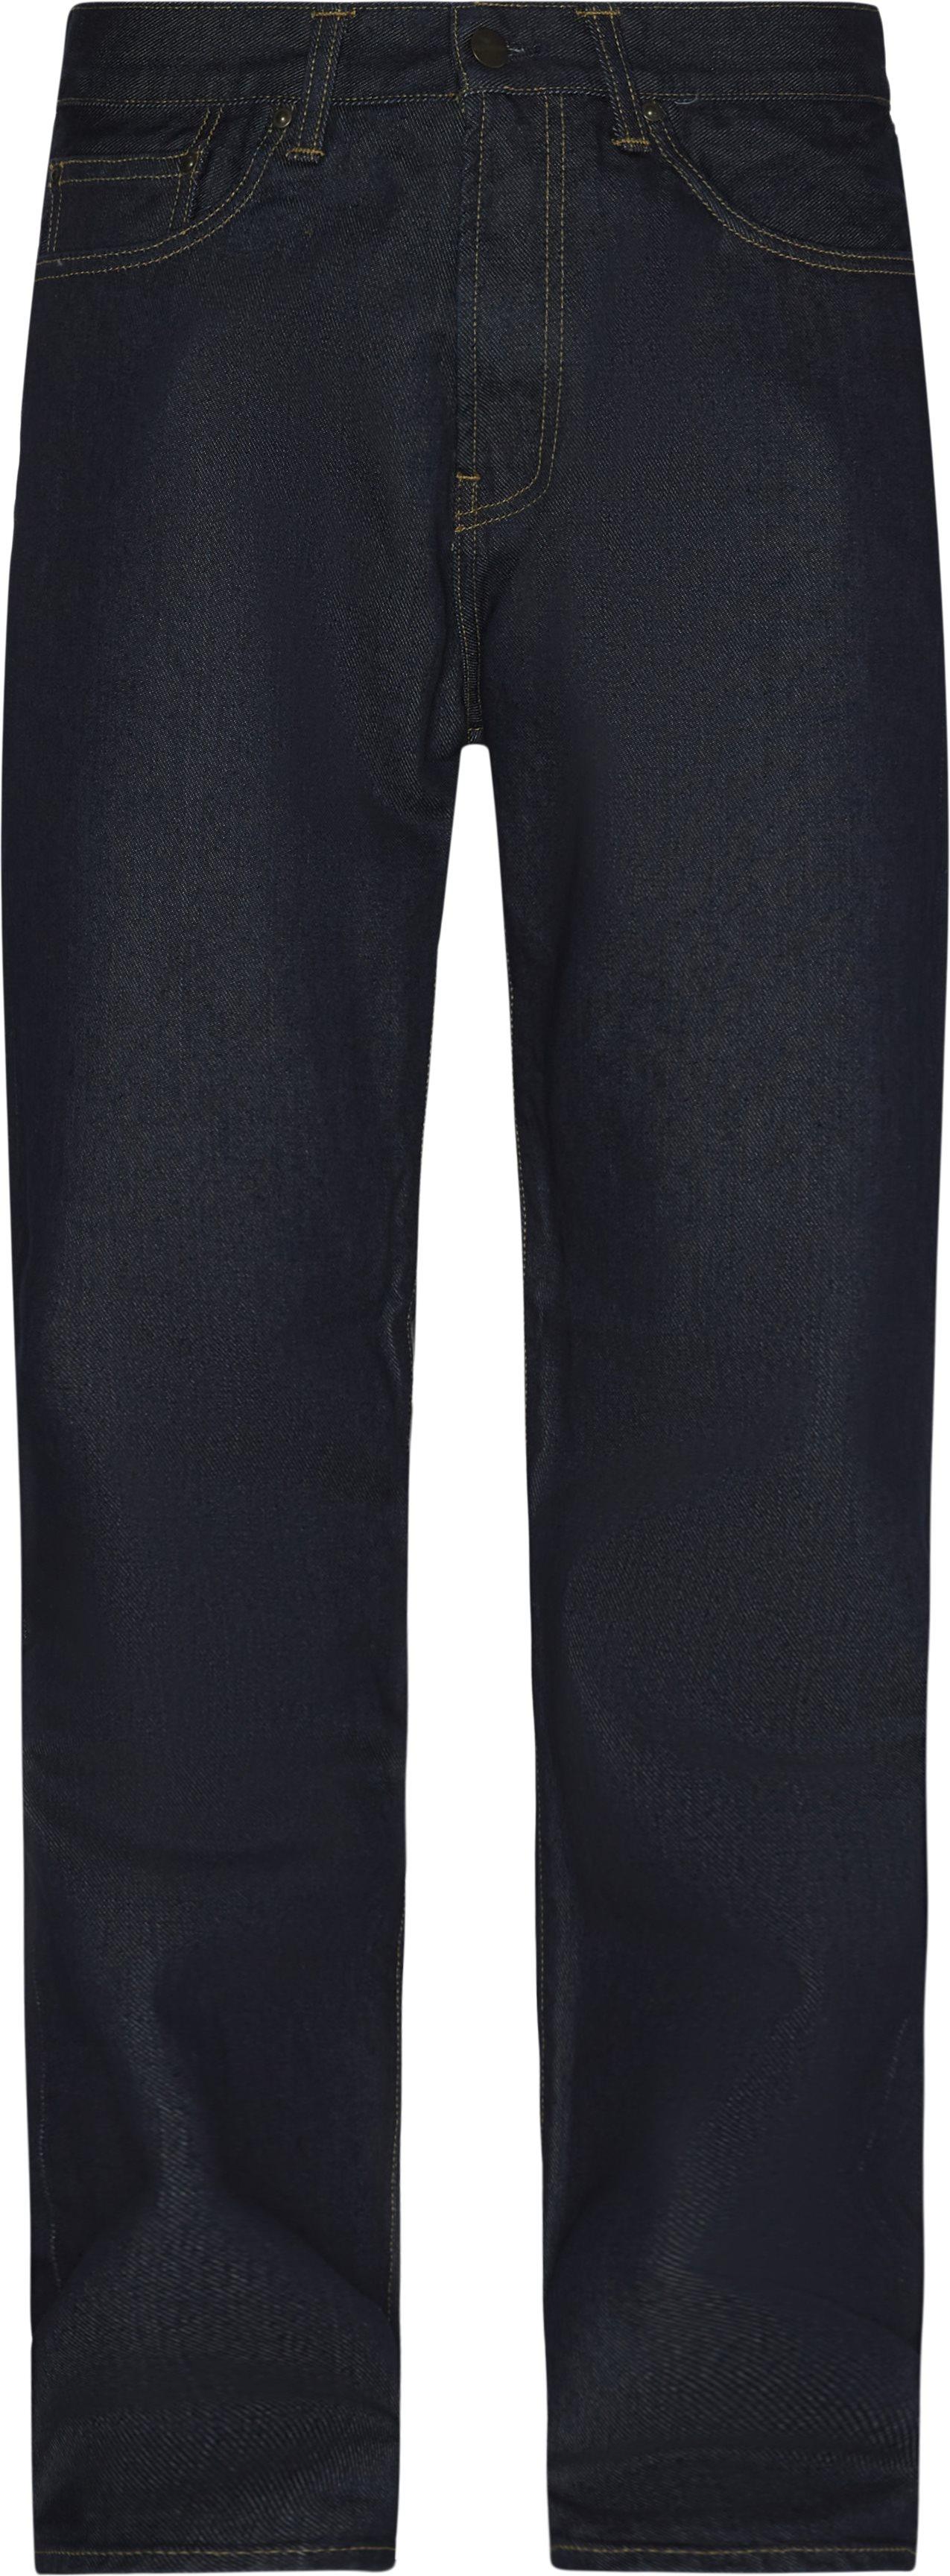 Pontiac Pant I029210 - Jeans - Straight fit - Blå